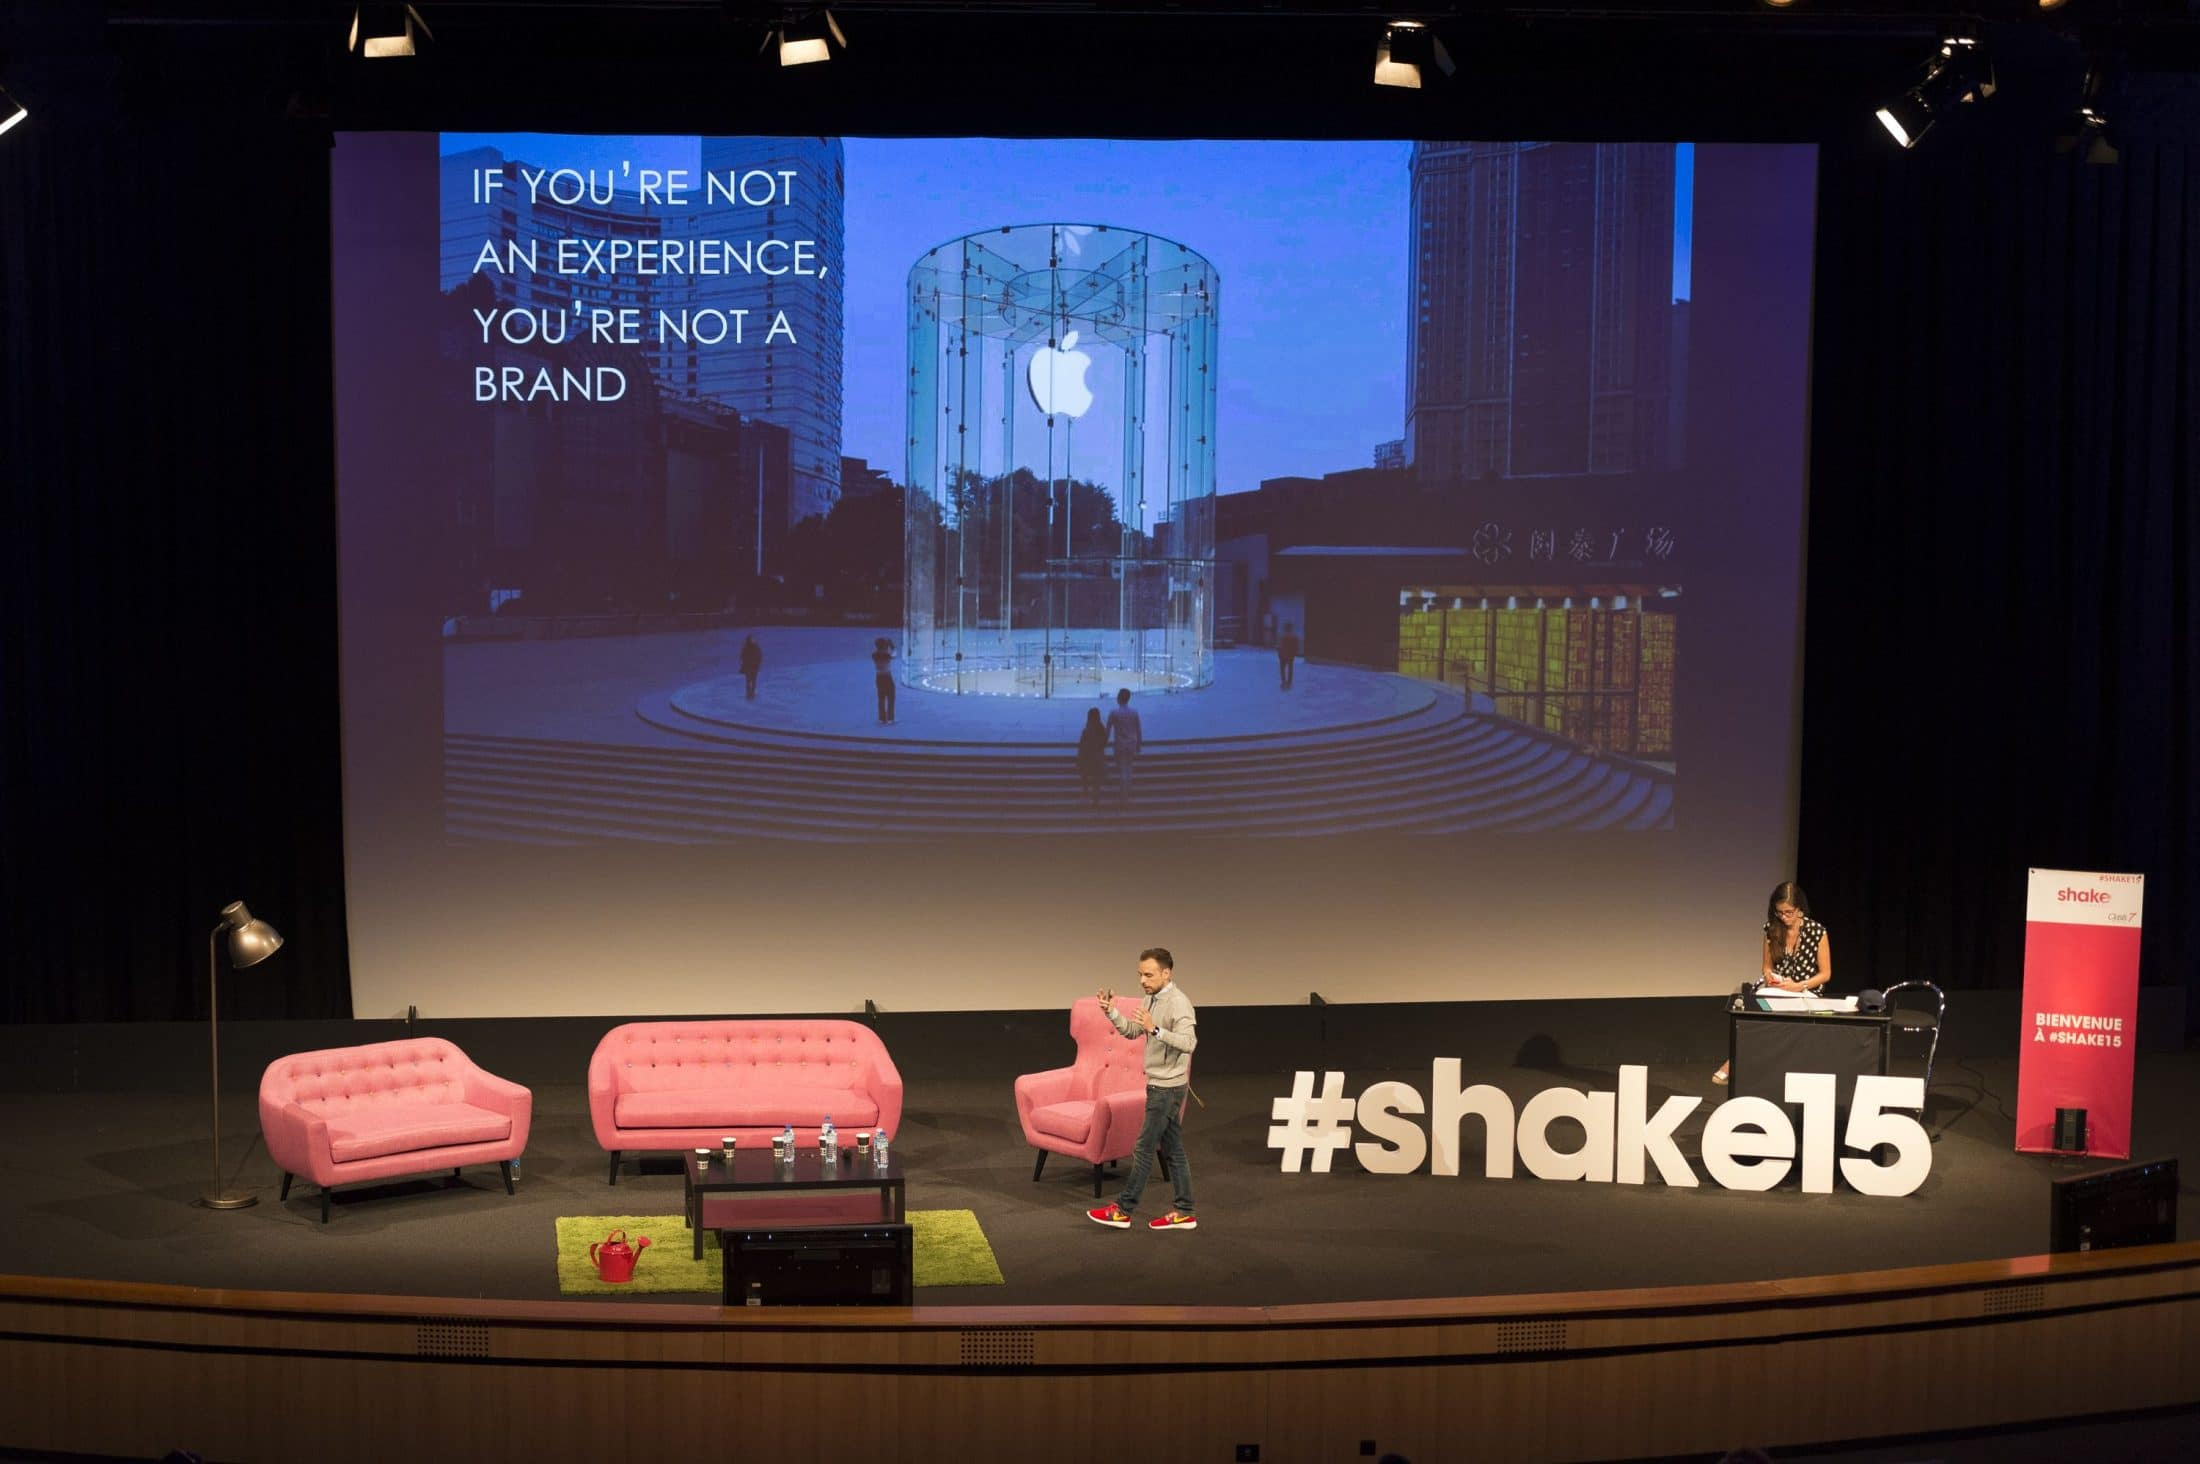 shake15